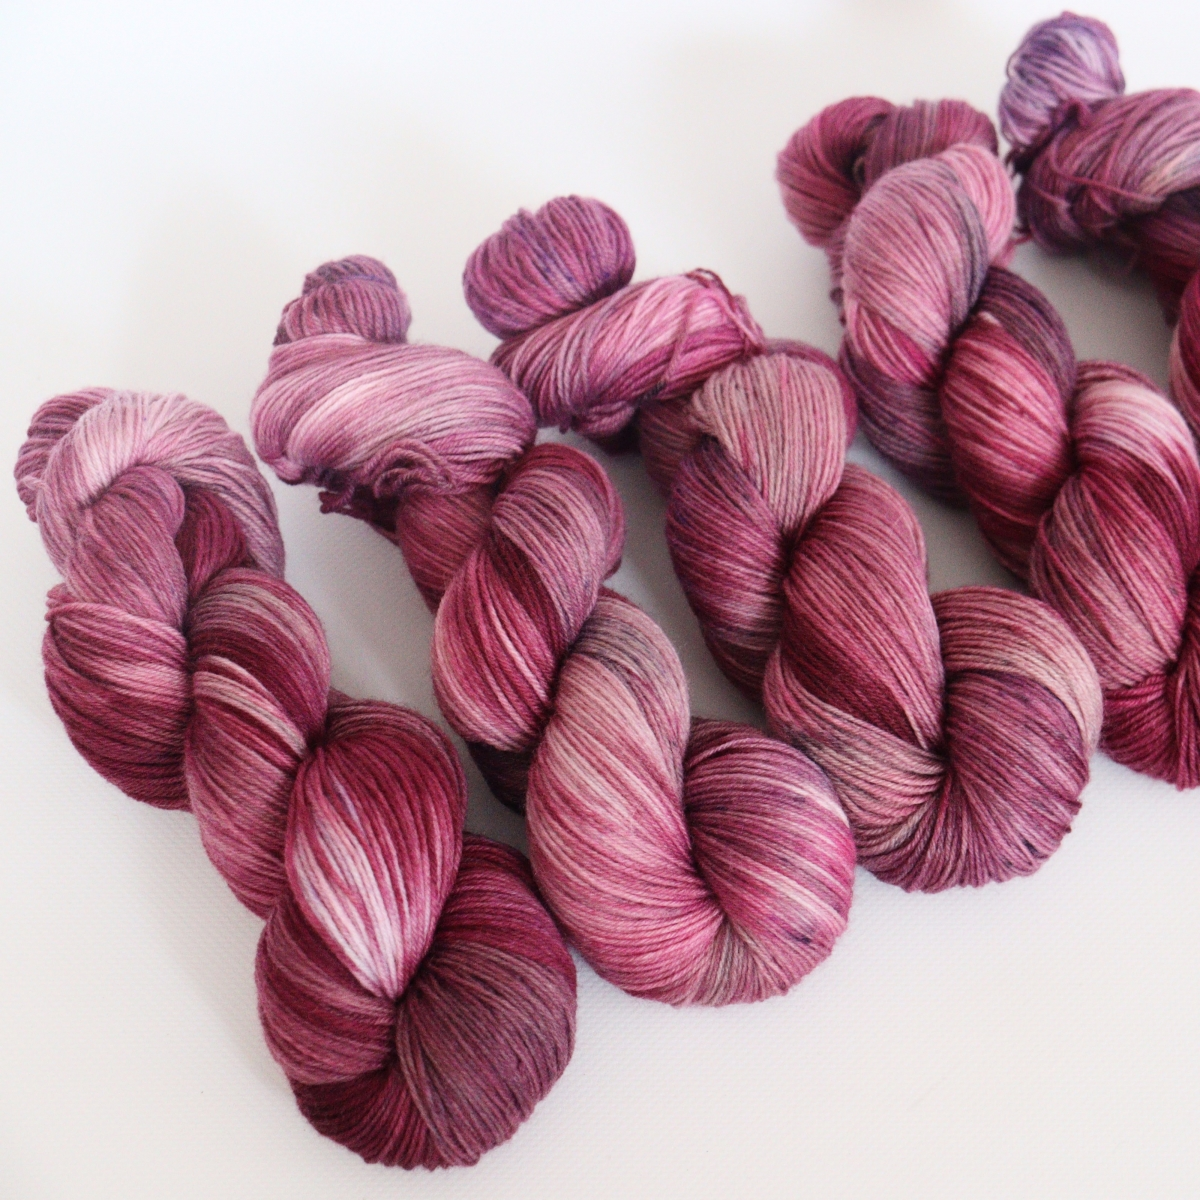 woodico.pro hand dyed yarn 057 2 1200x1200 - Hand dyed yarn / 057